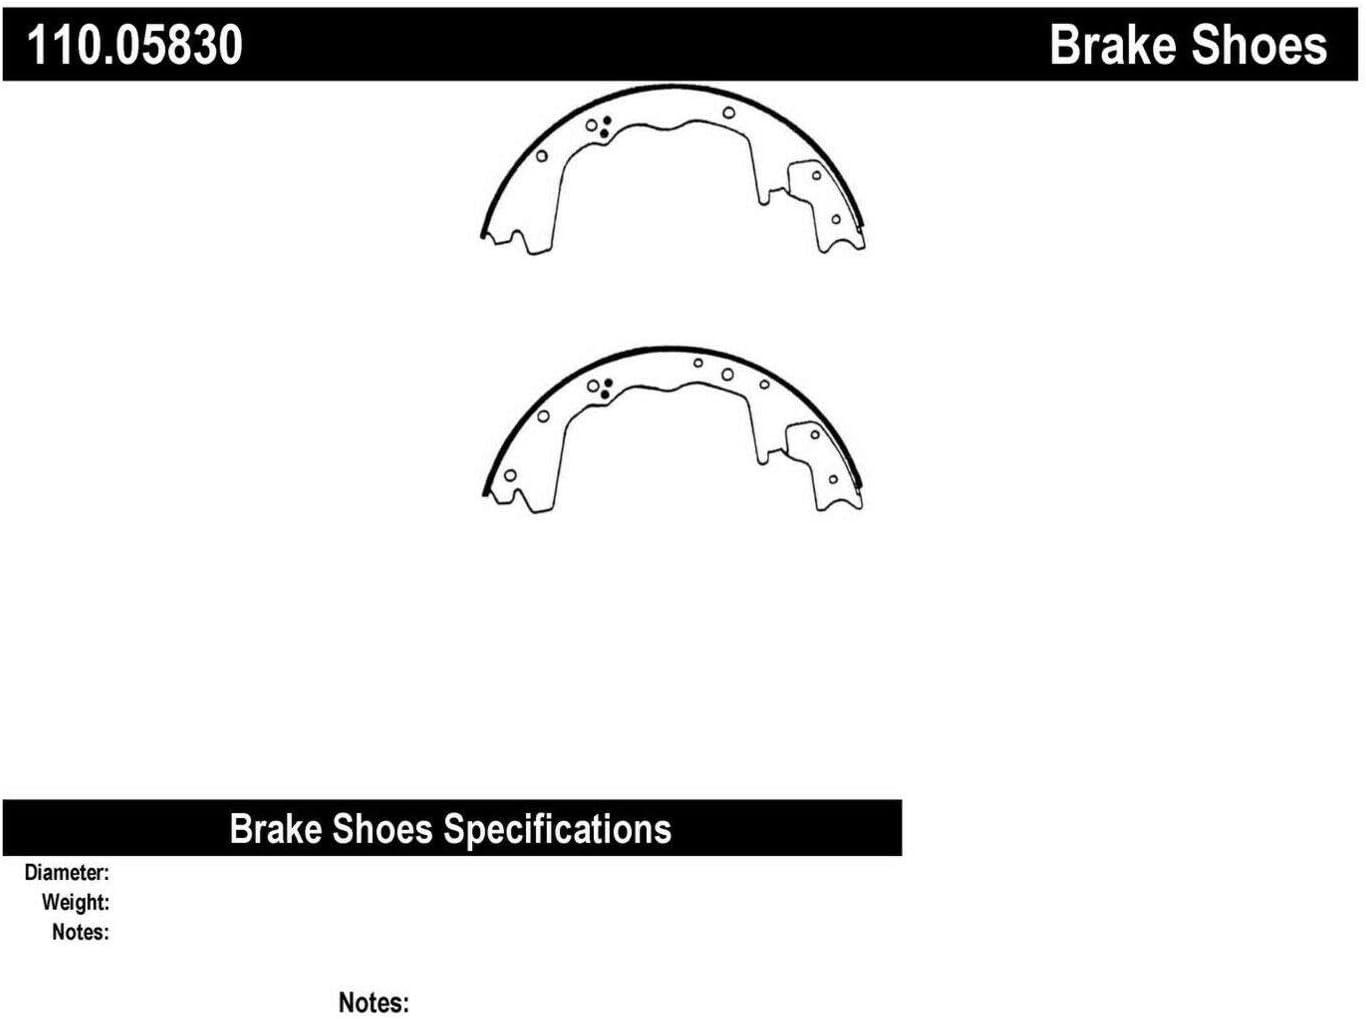 Centric 110.05830 Brake Shoe